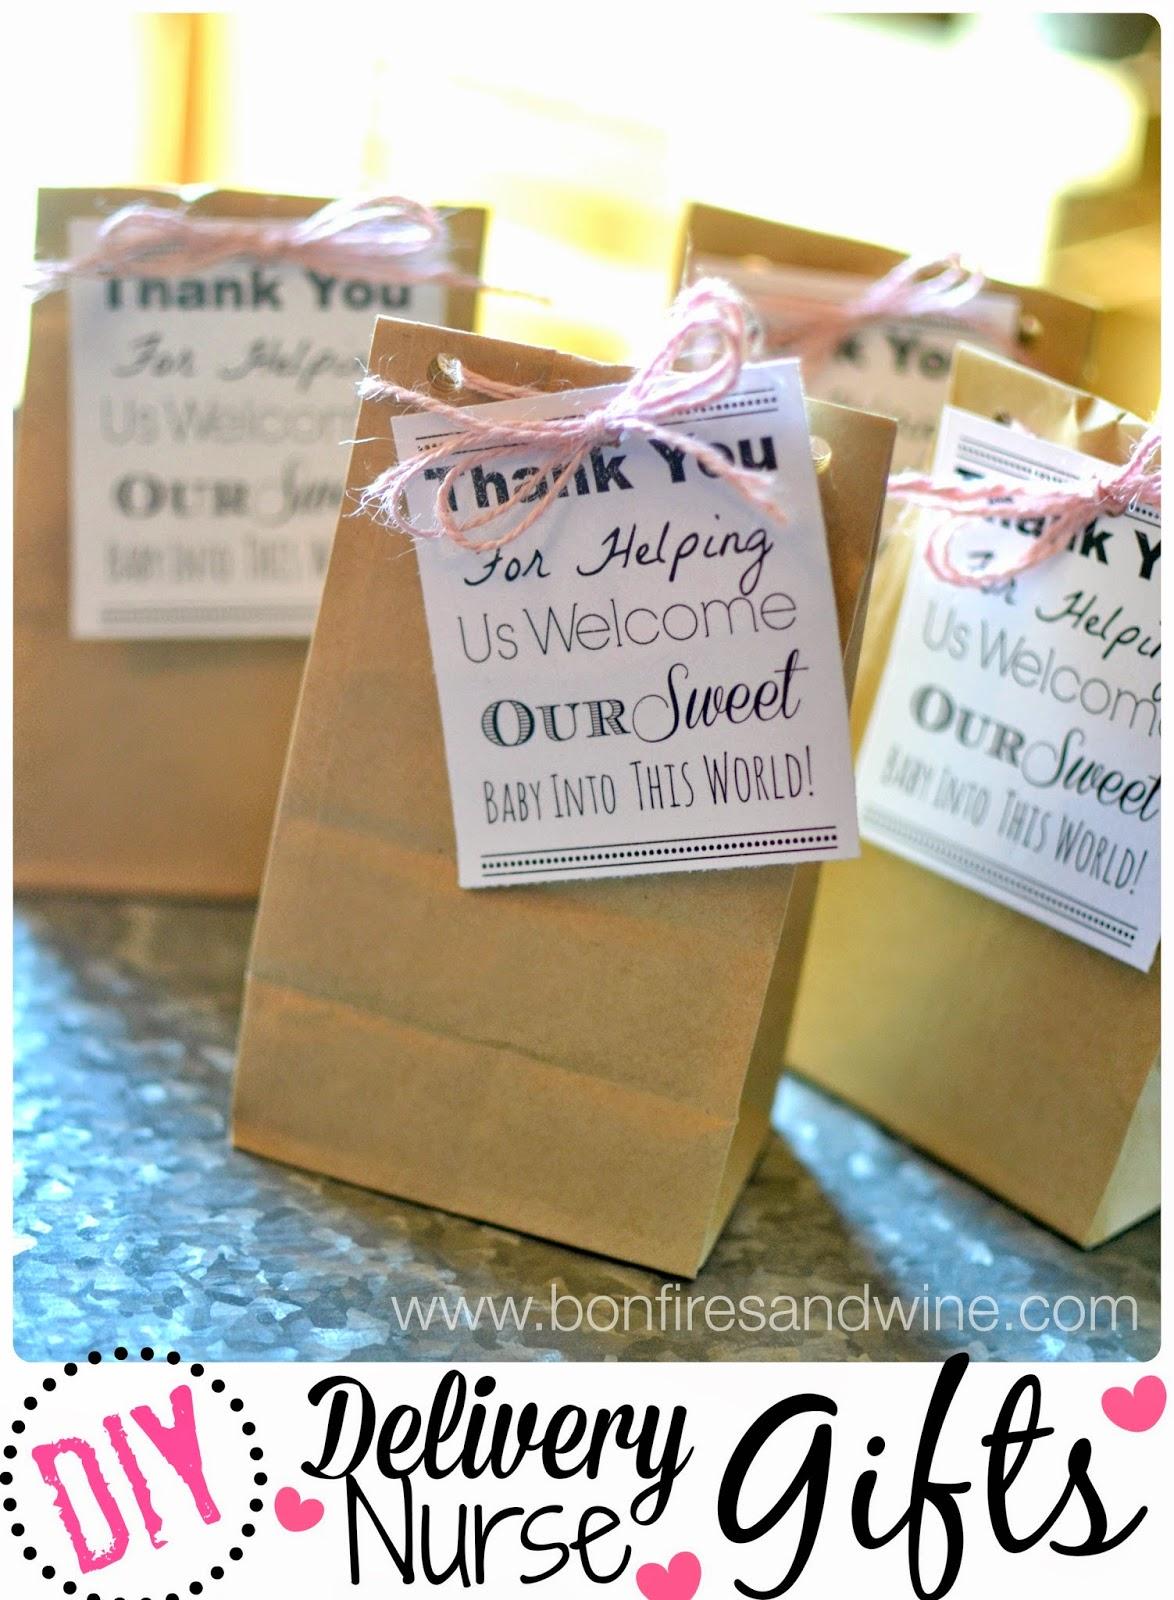 Bonfires And Wine Diy Labor Delivery Nurse Gifts